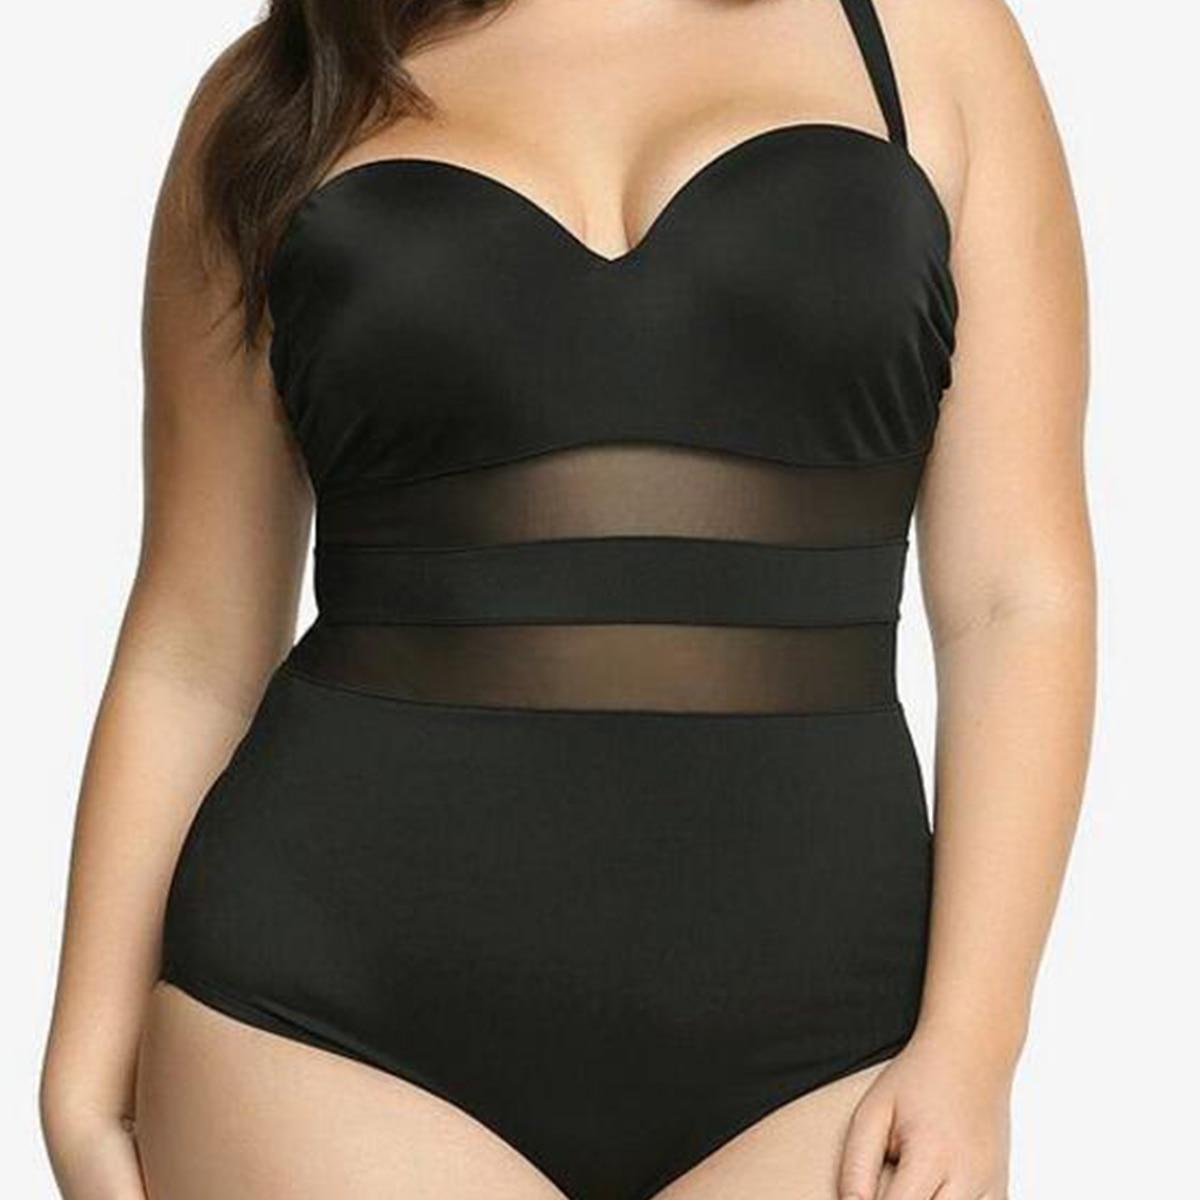 fc7d5d9152 Aliexpress.com   Buy Plus Big Size 4XL Women s Sexy Cheely Bustier Push Up  Mesh One Piece Beachwear Sets Swimsuits Bath Bathing Suits Swimwear 2017  from ...